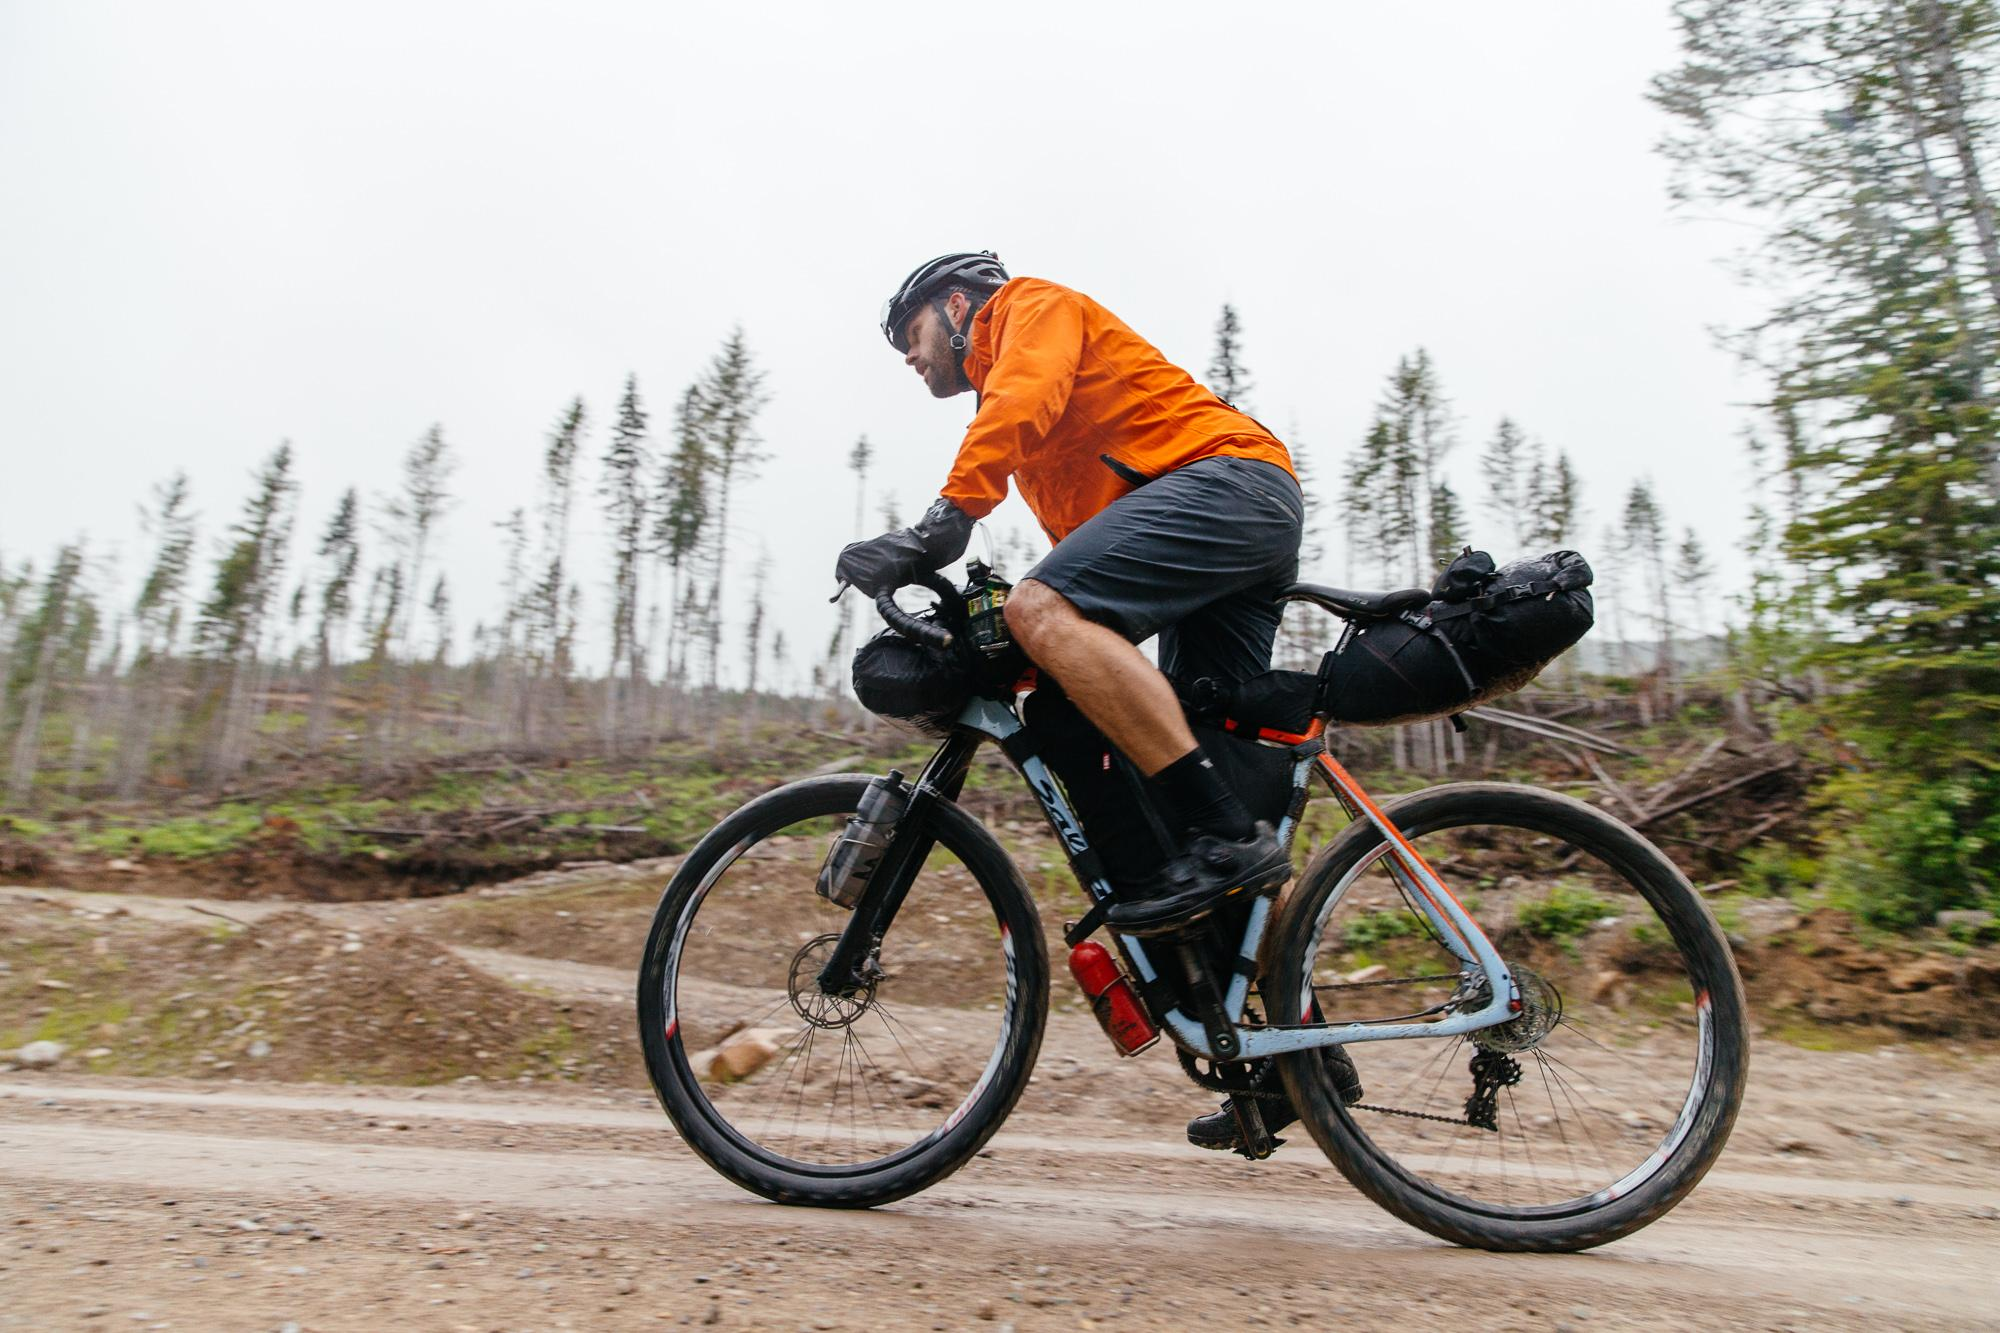 Climbing the last logging road